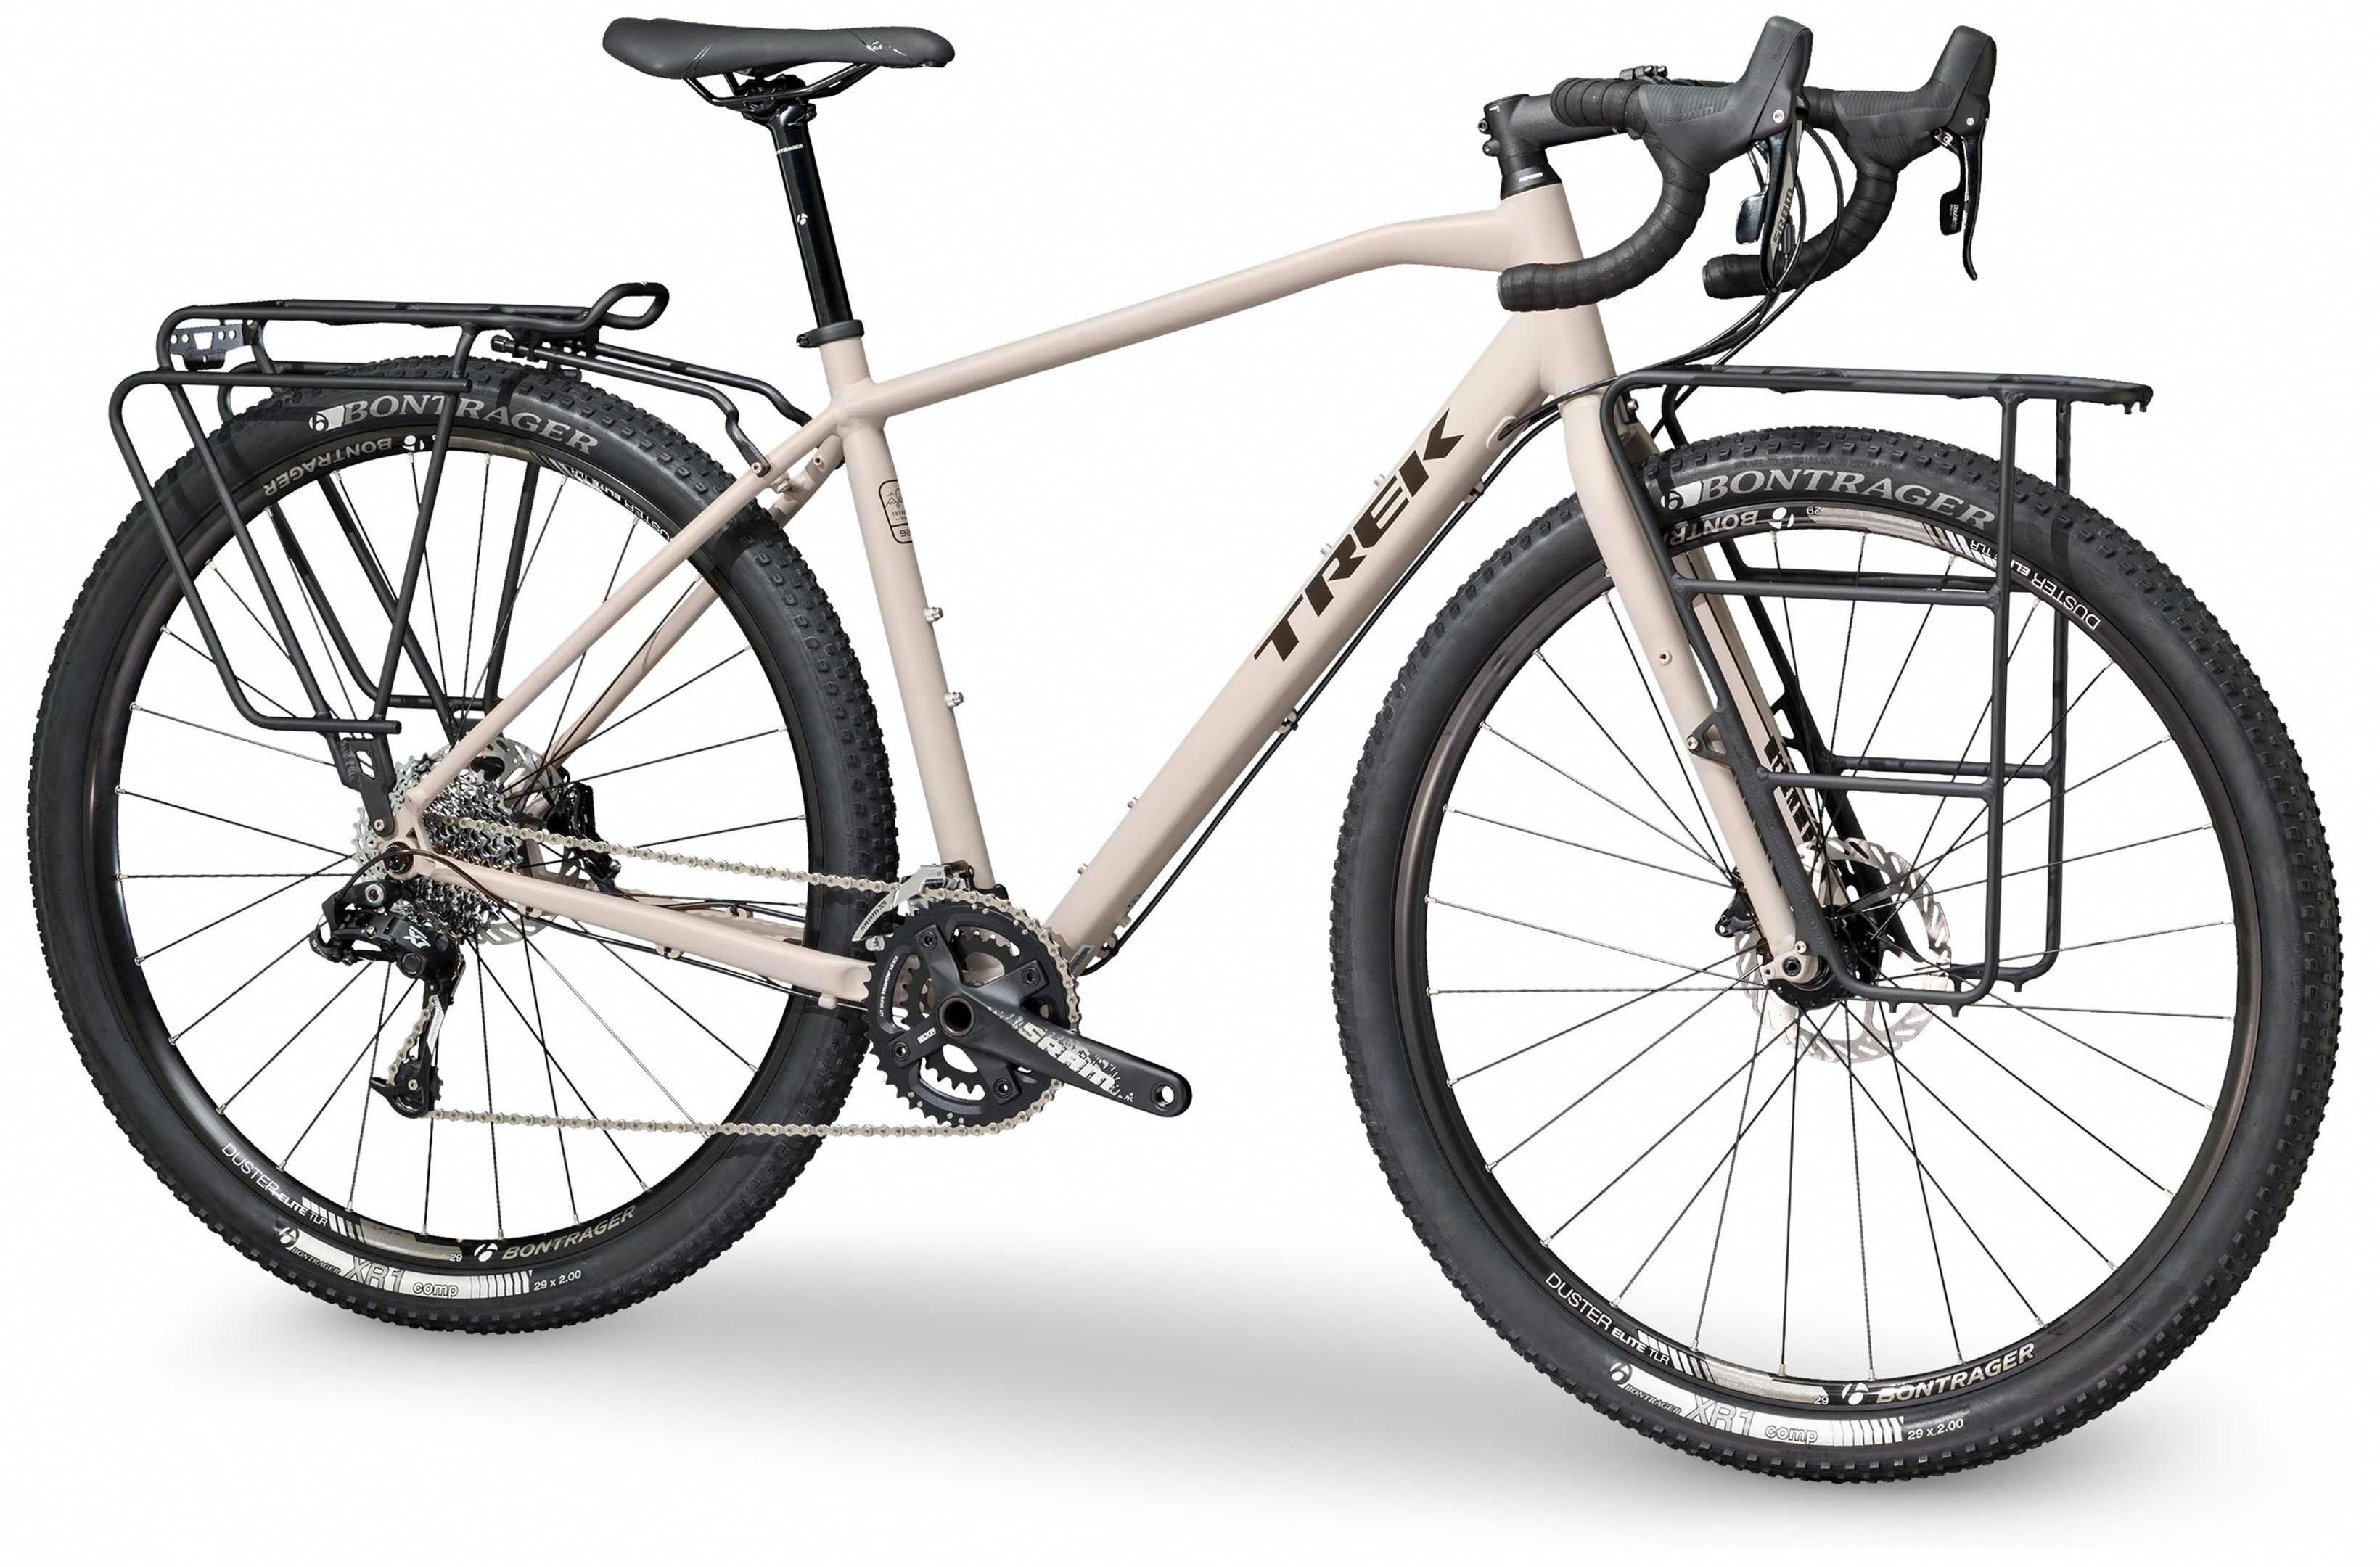 The Best Ways To Purchase A Mountain Bike Touring Bike Bike